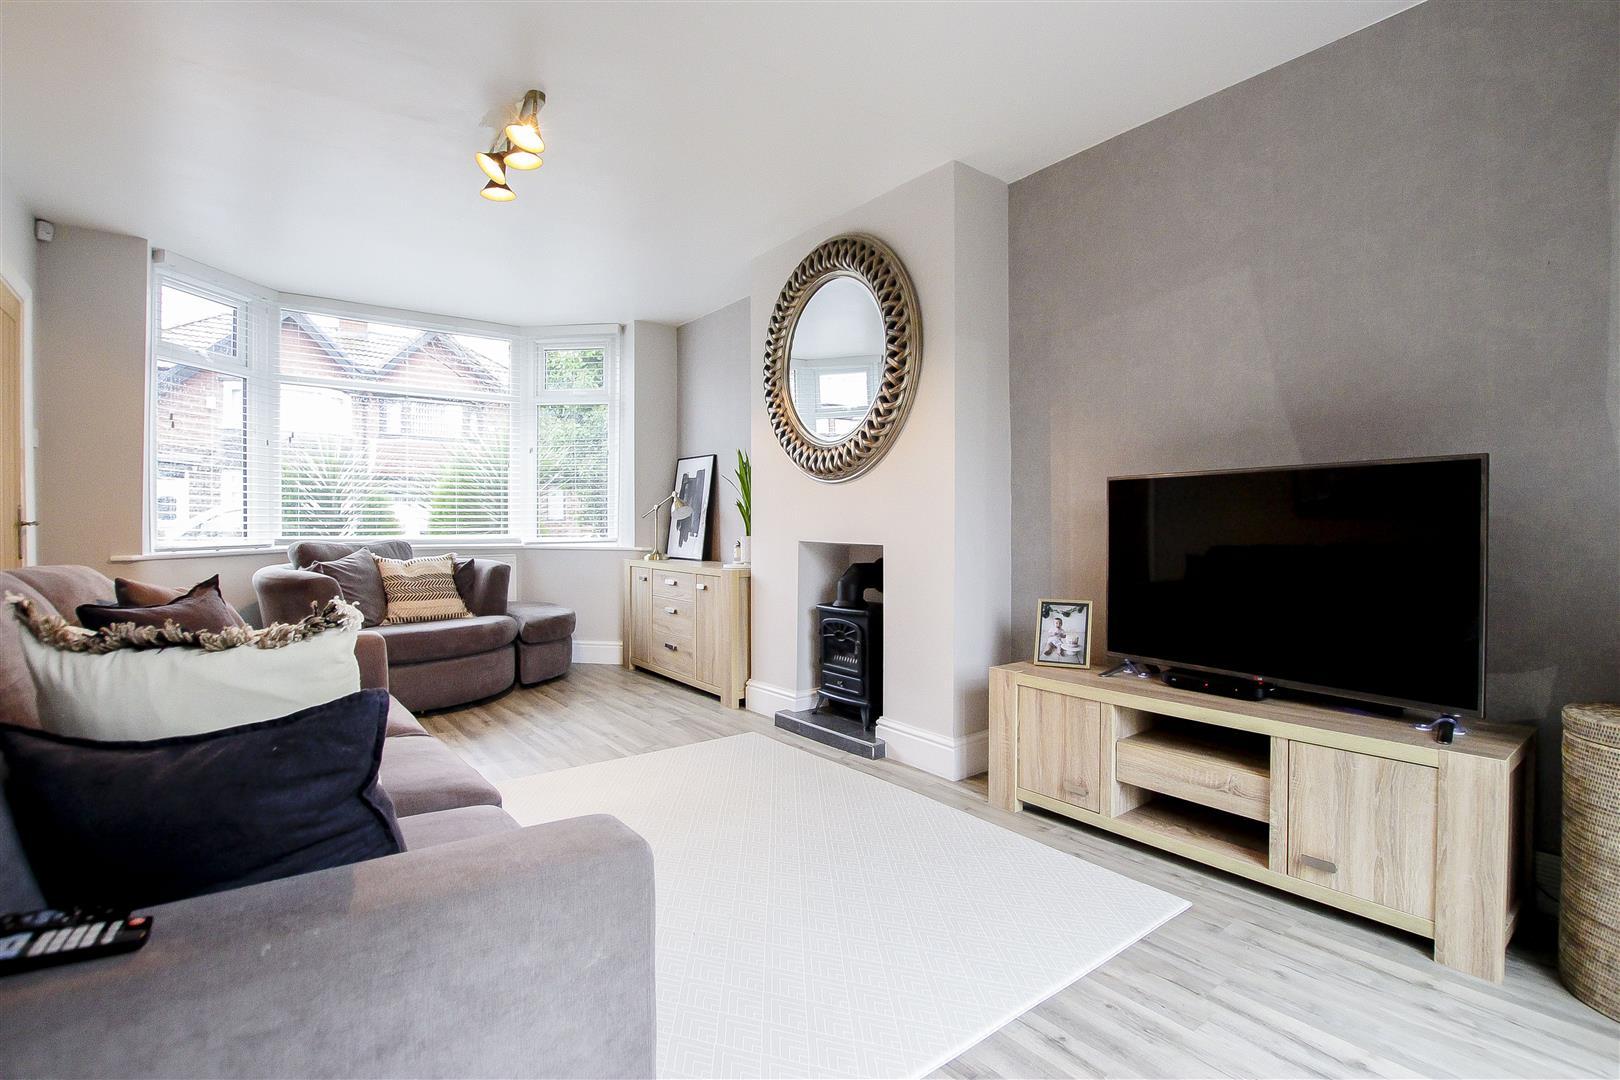 3 Bedroom Semi Detached House For Sale In Parkgate Drive Manchester M27 Keenans Estate Agents Ltd